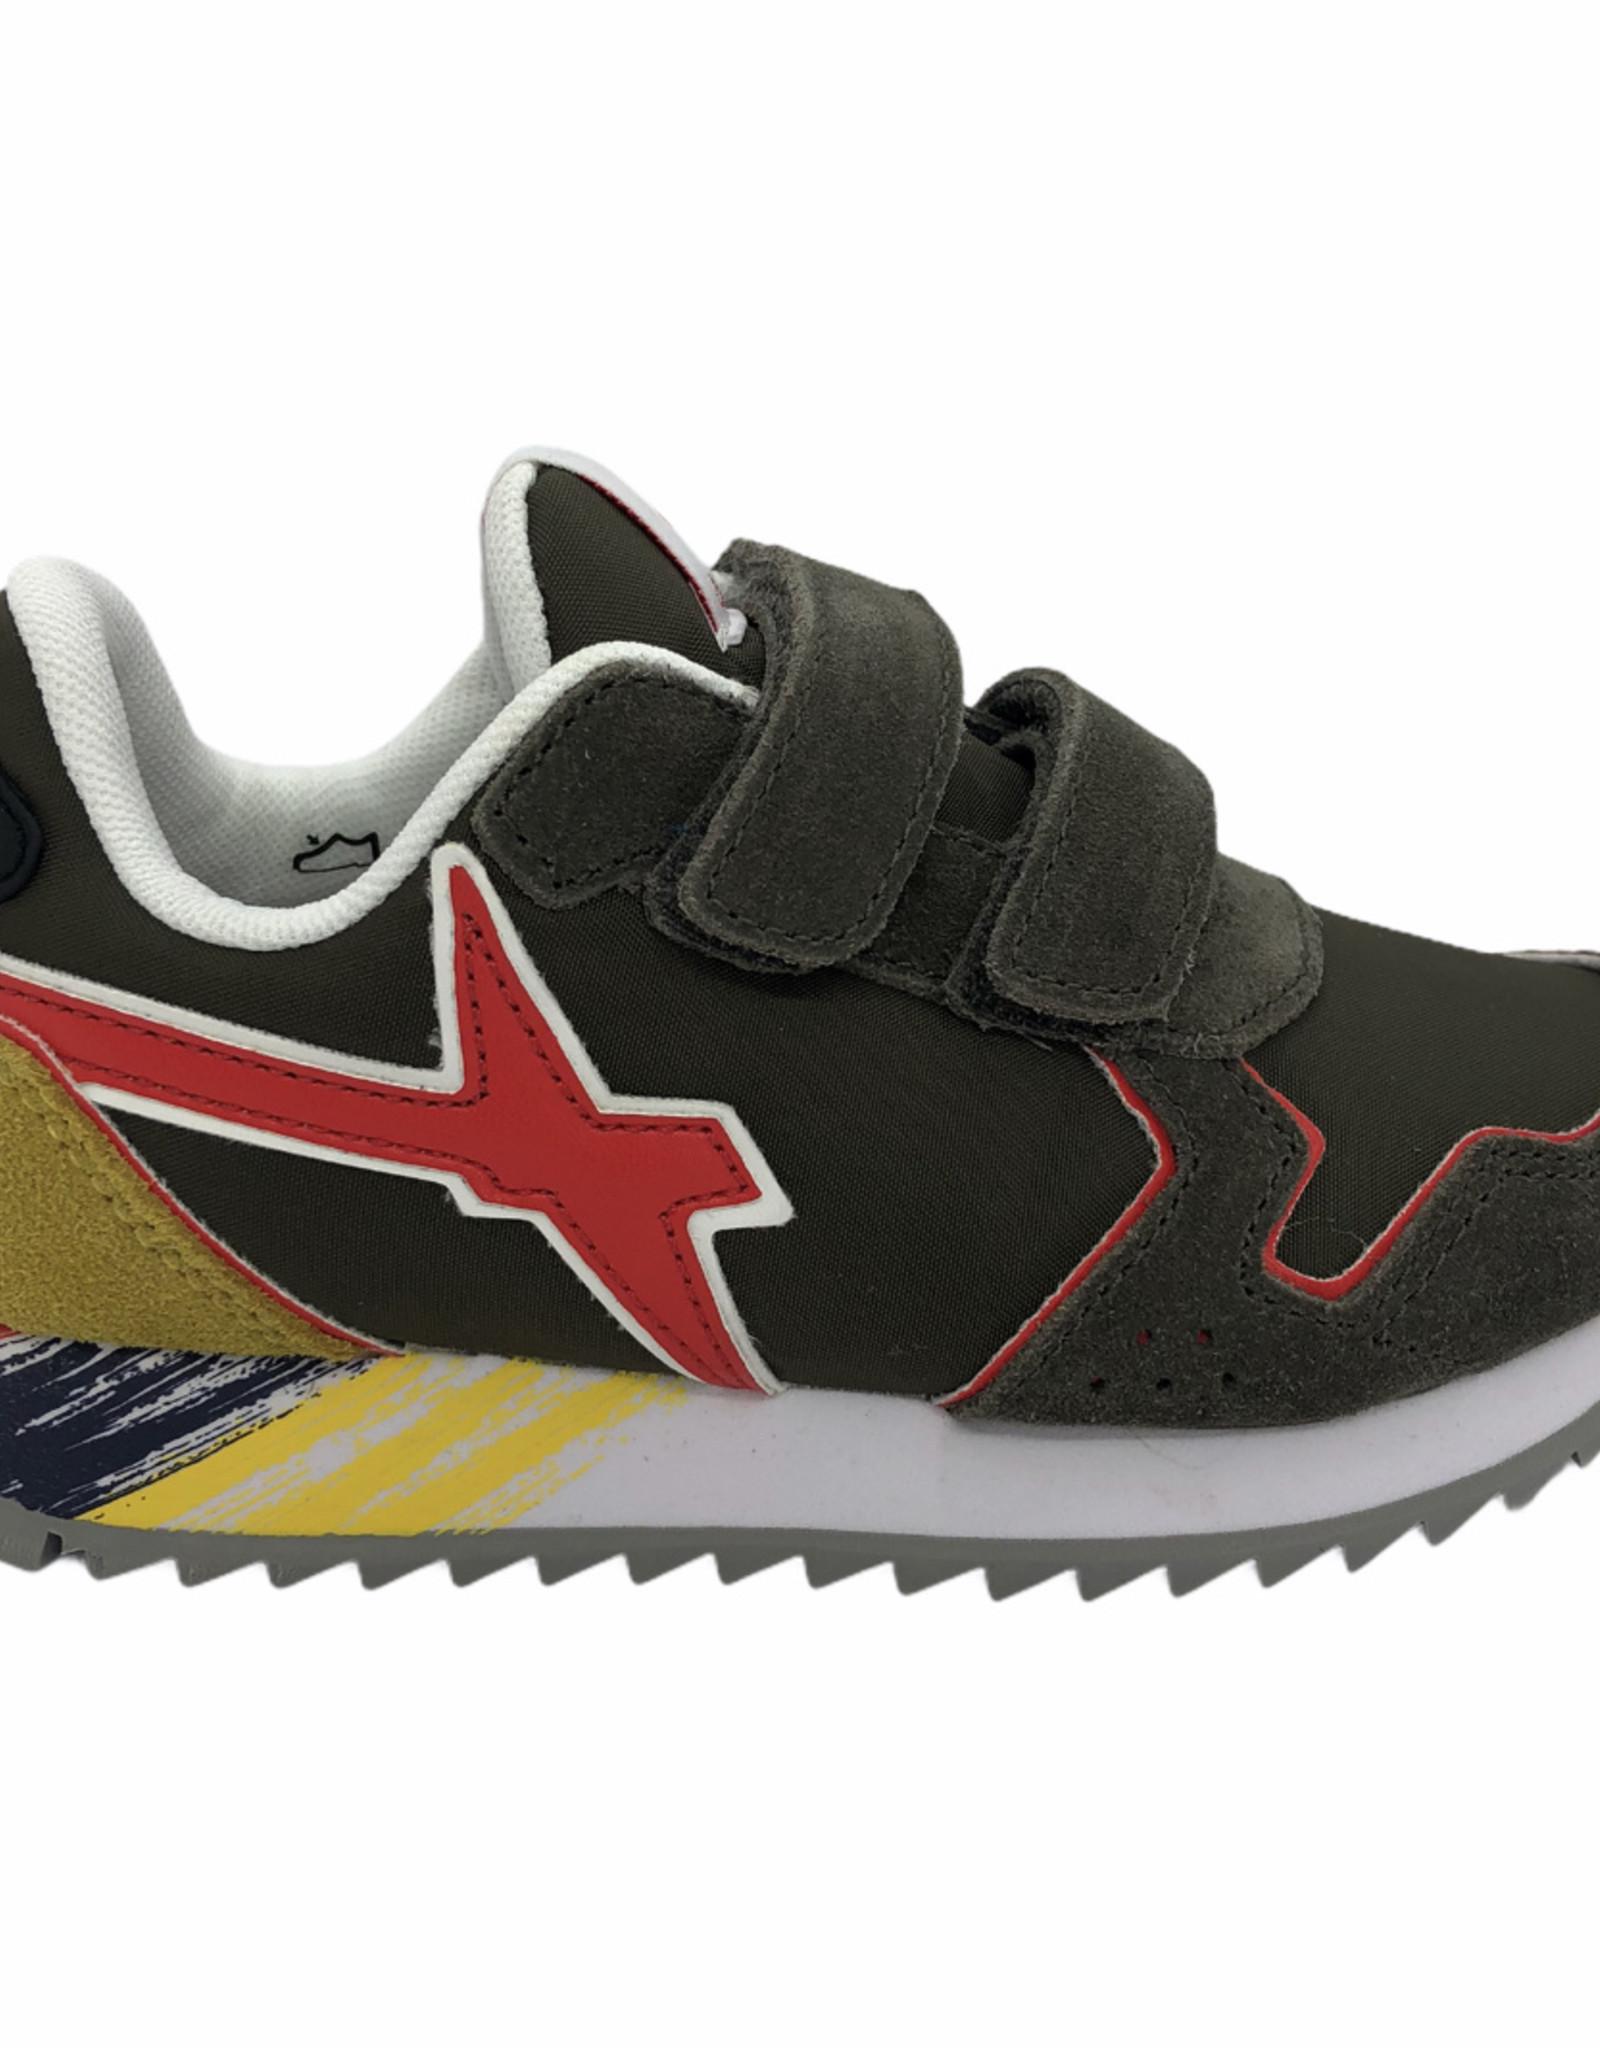 W6YZ sneaker militare-red velcro